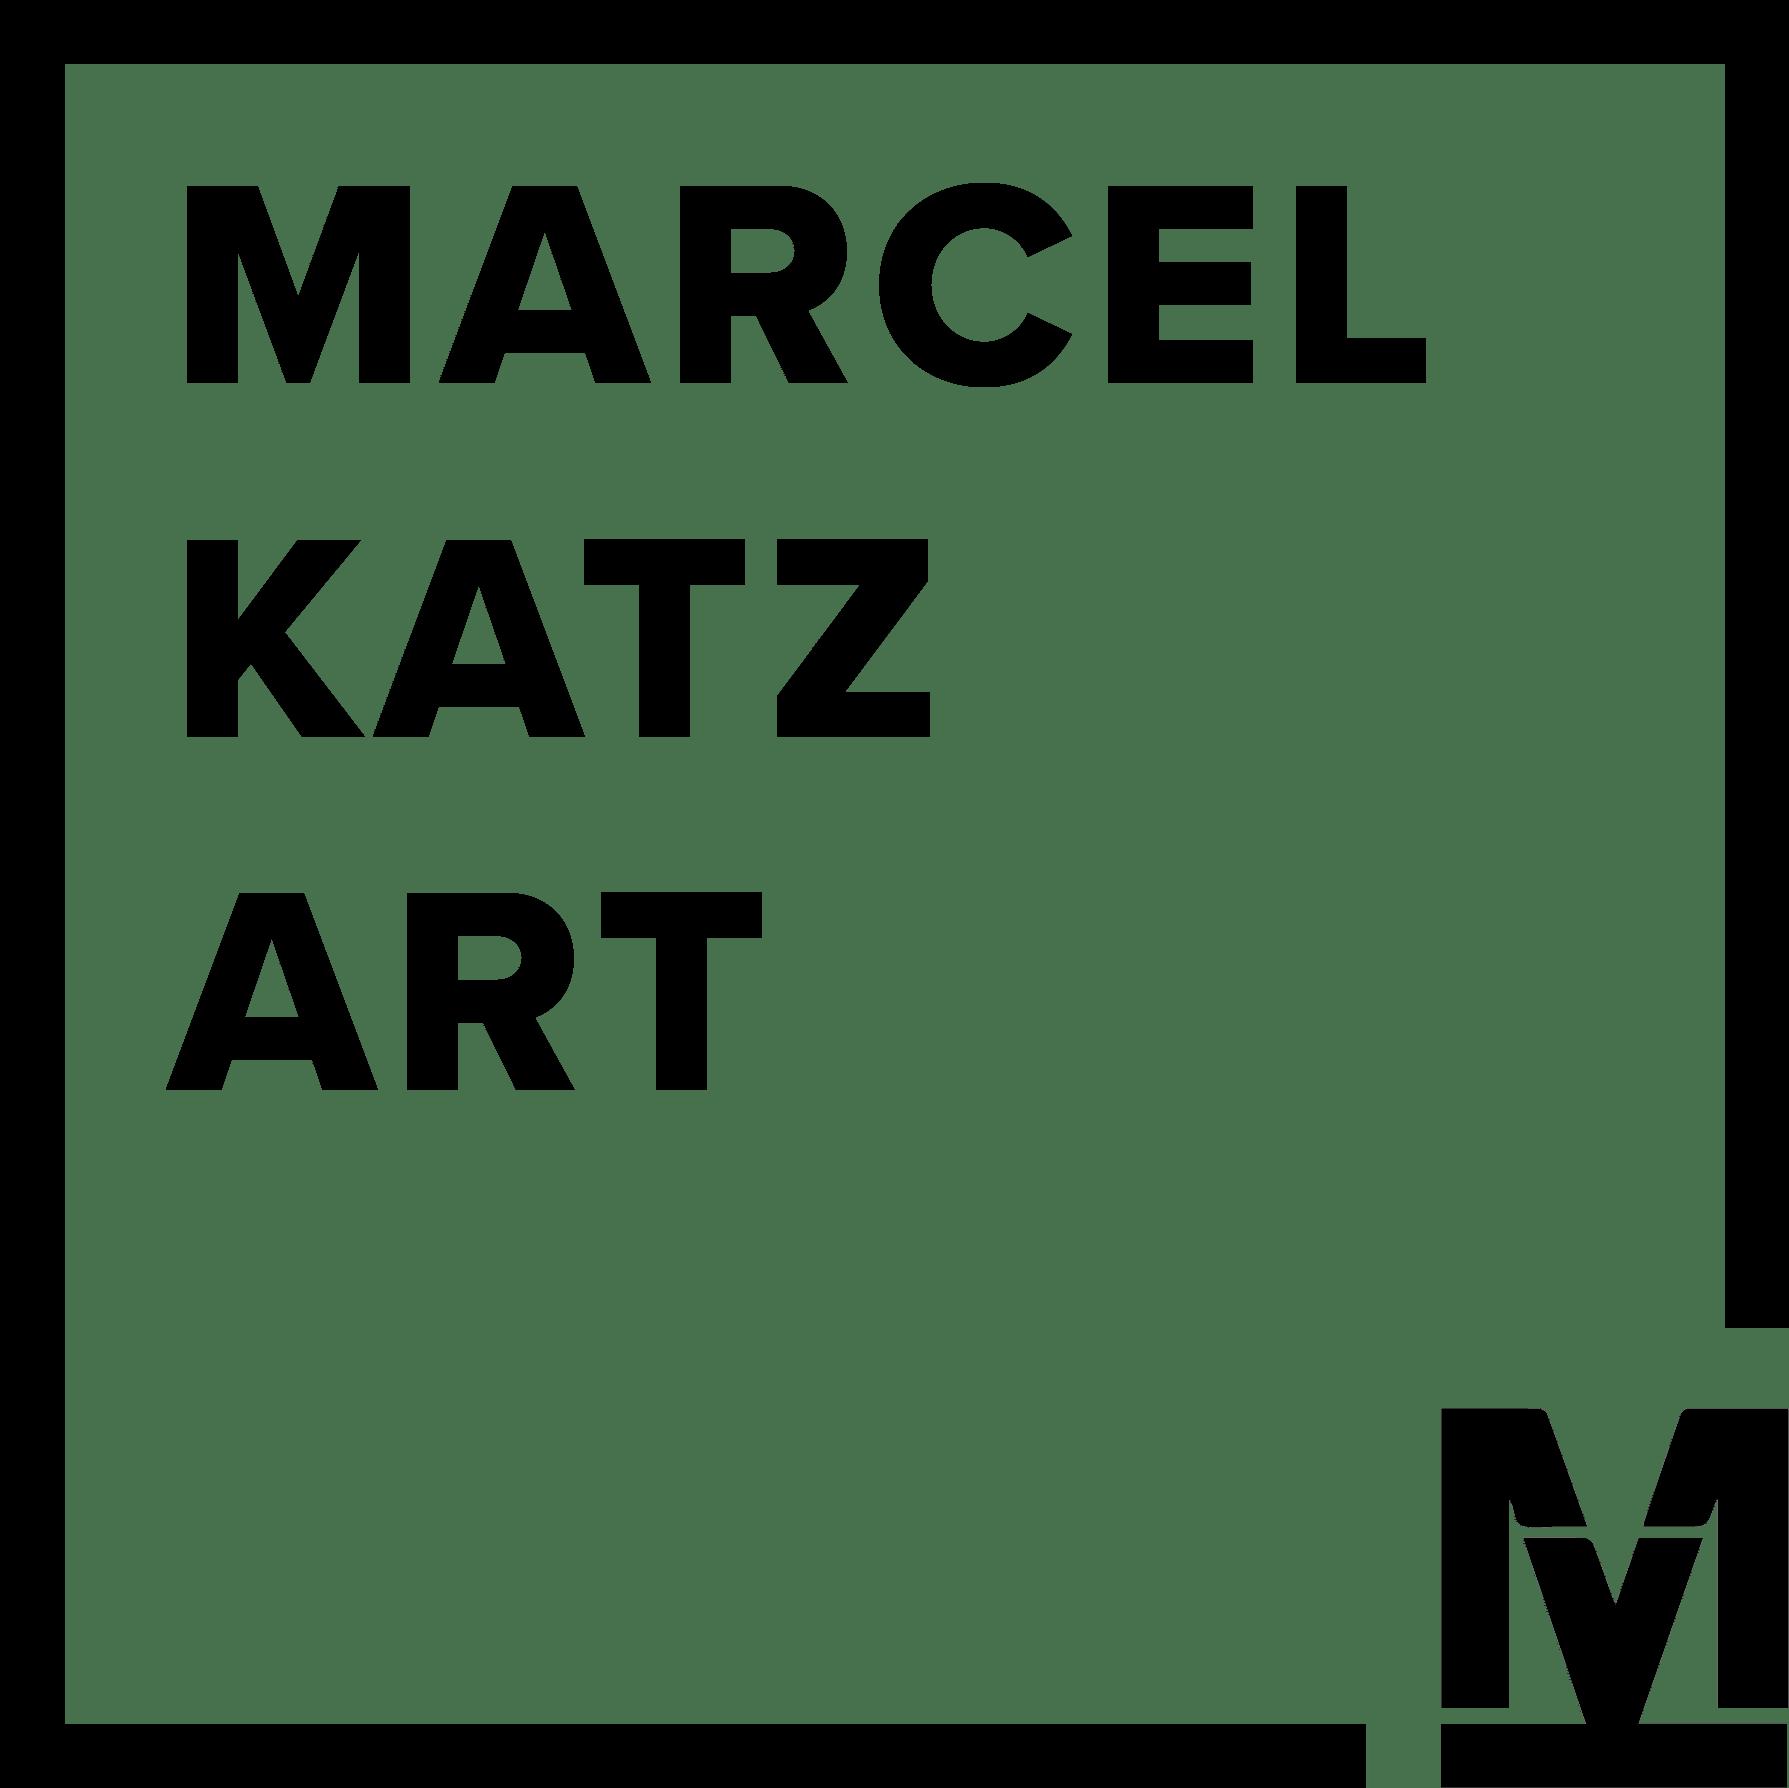 Marcel Katz Art company logo